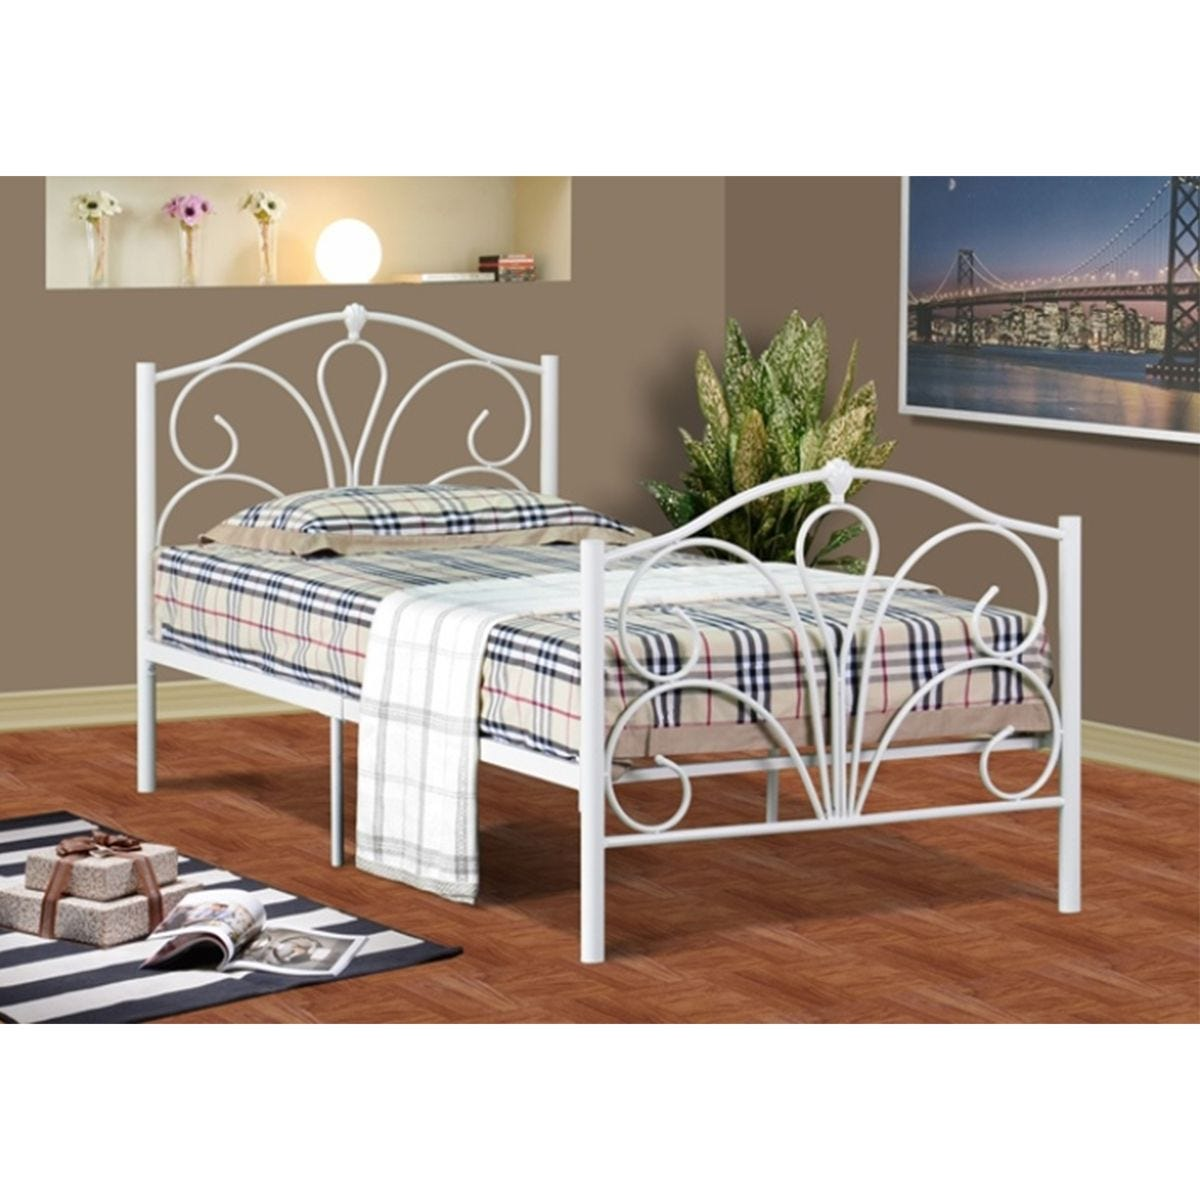 Scarlet Bed Frame - White